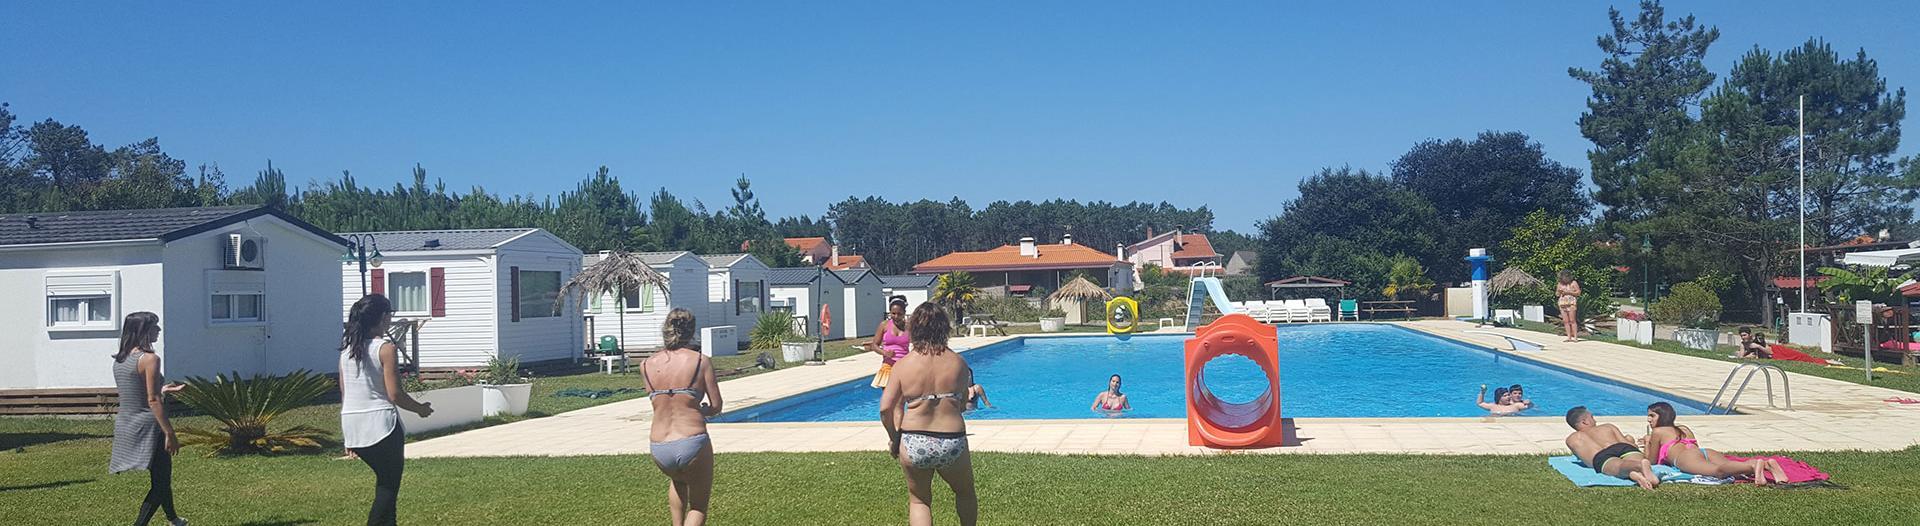 slider-camping-land-hause-loisirs-piscine